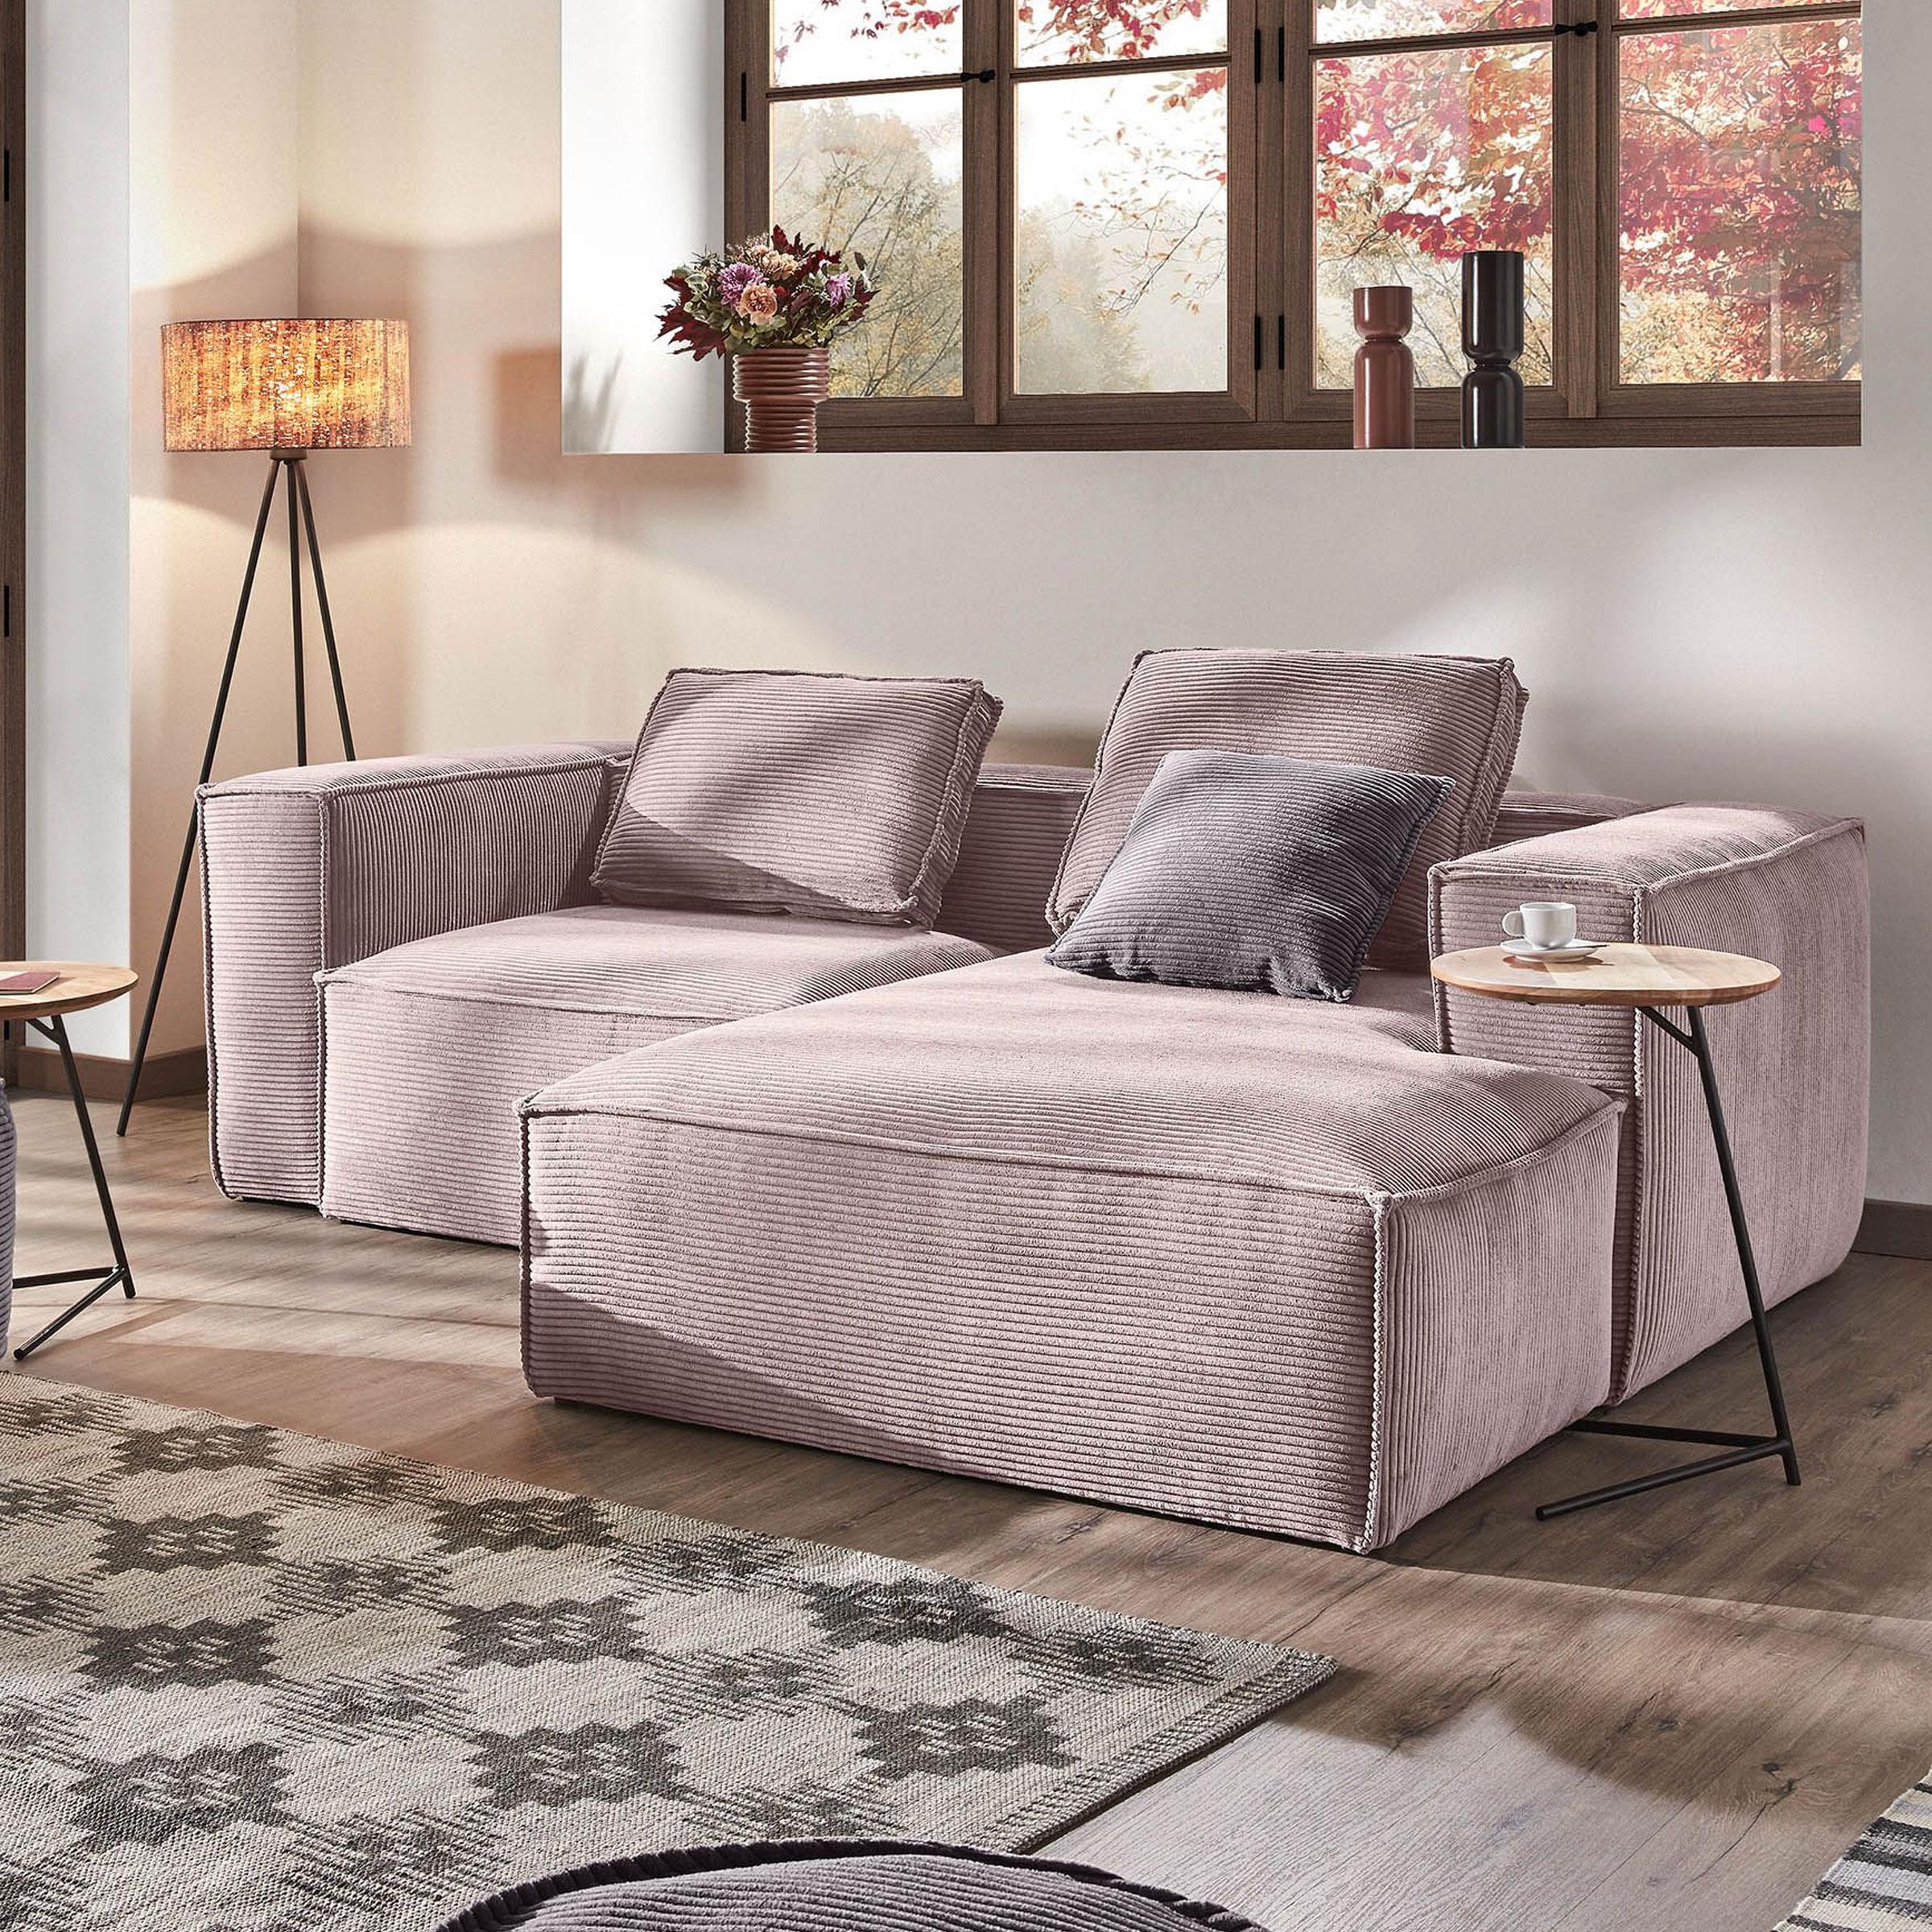 Kave Home Loungebank 'Blok' Rib, Rechts 240cm, kleur Roze